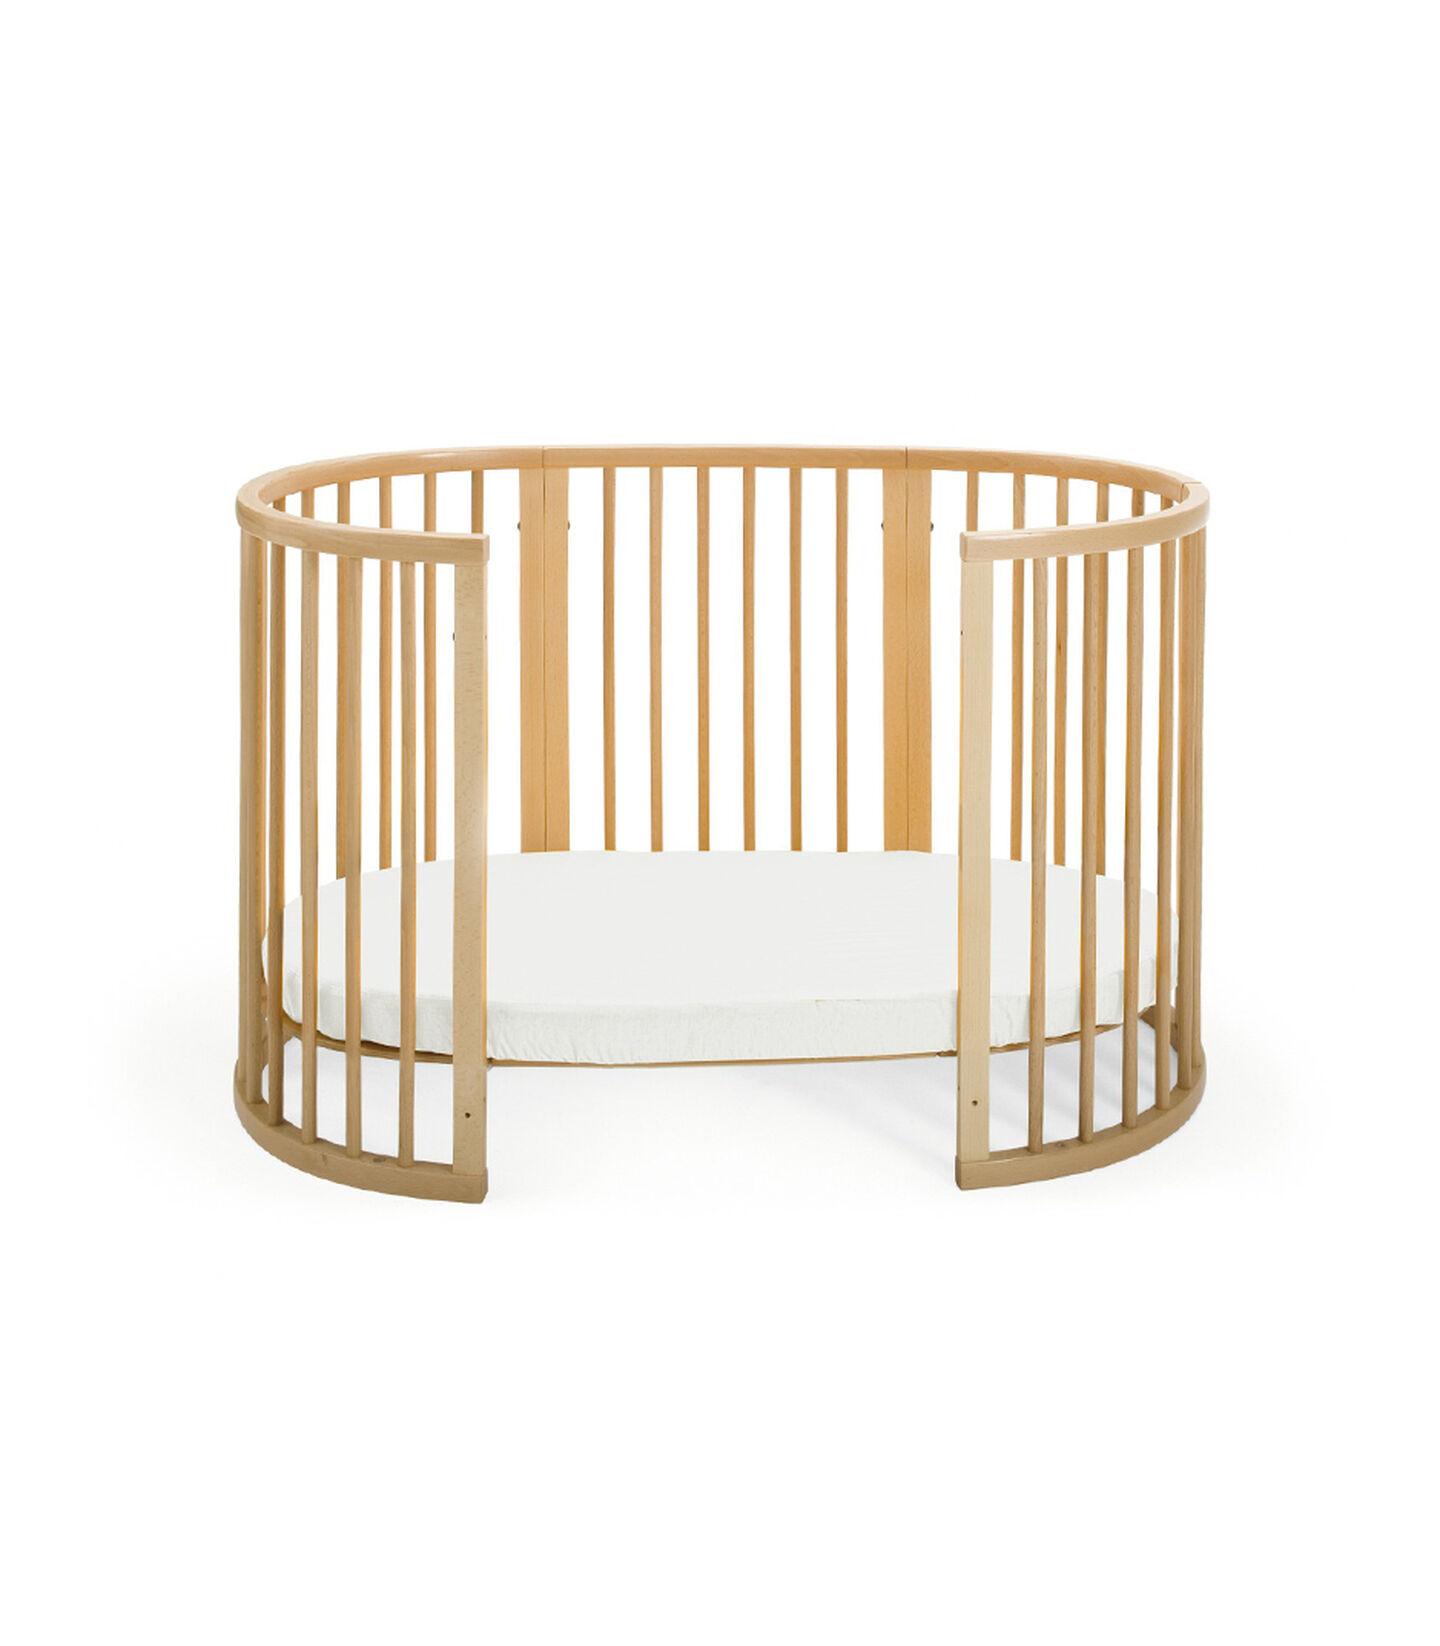 Toddler Bed, Natural.